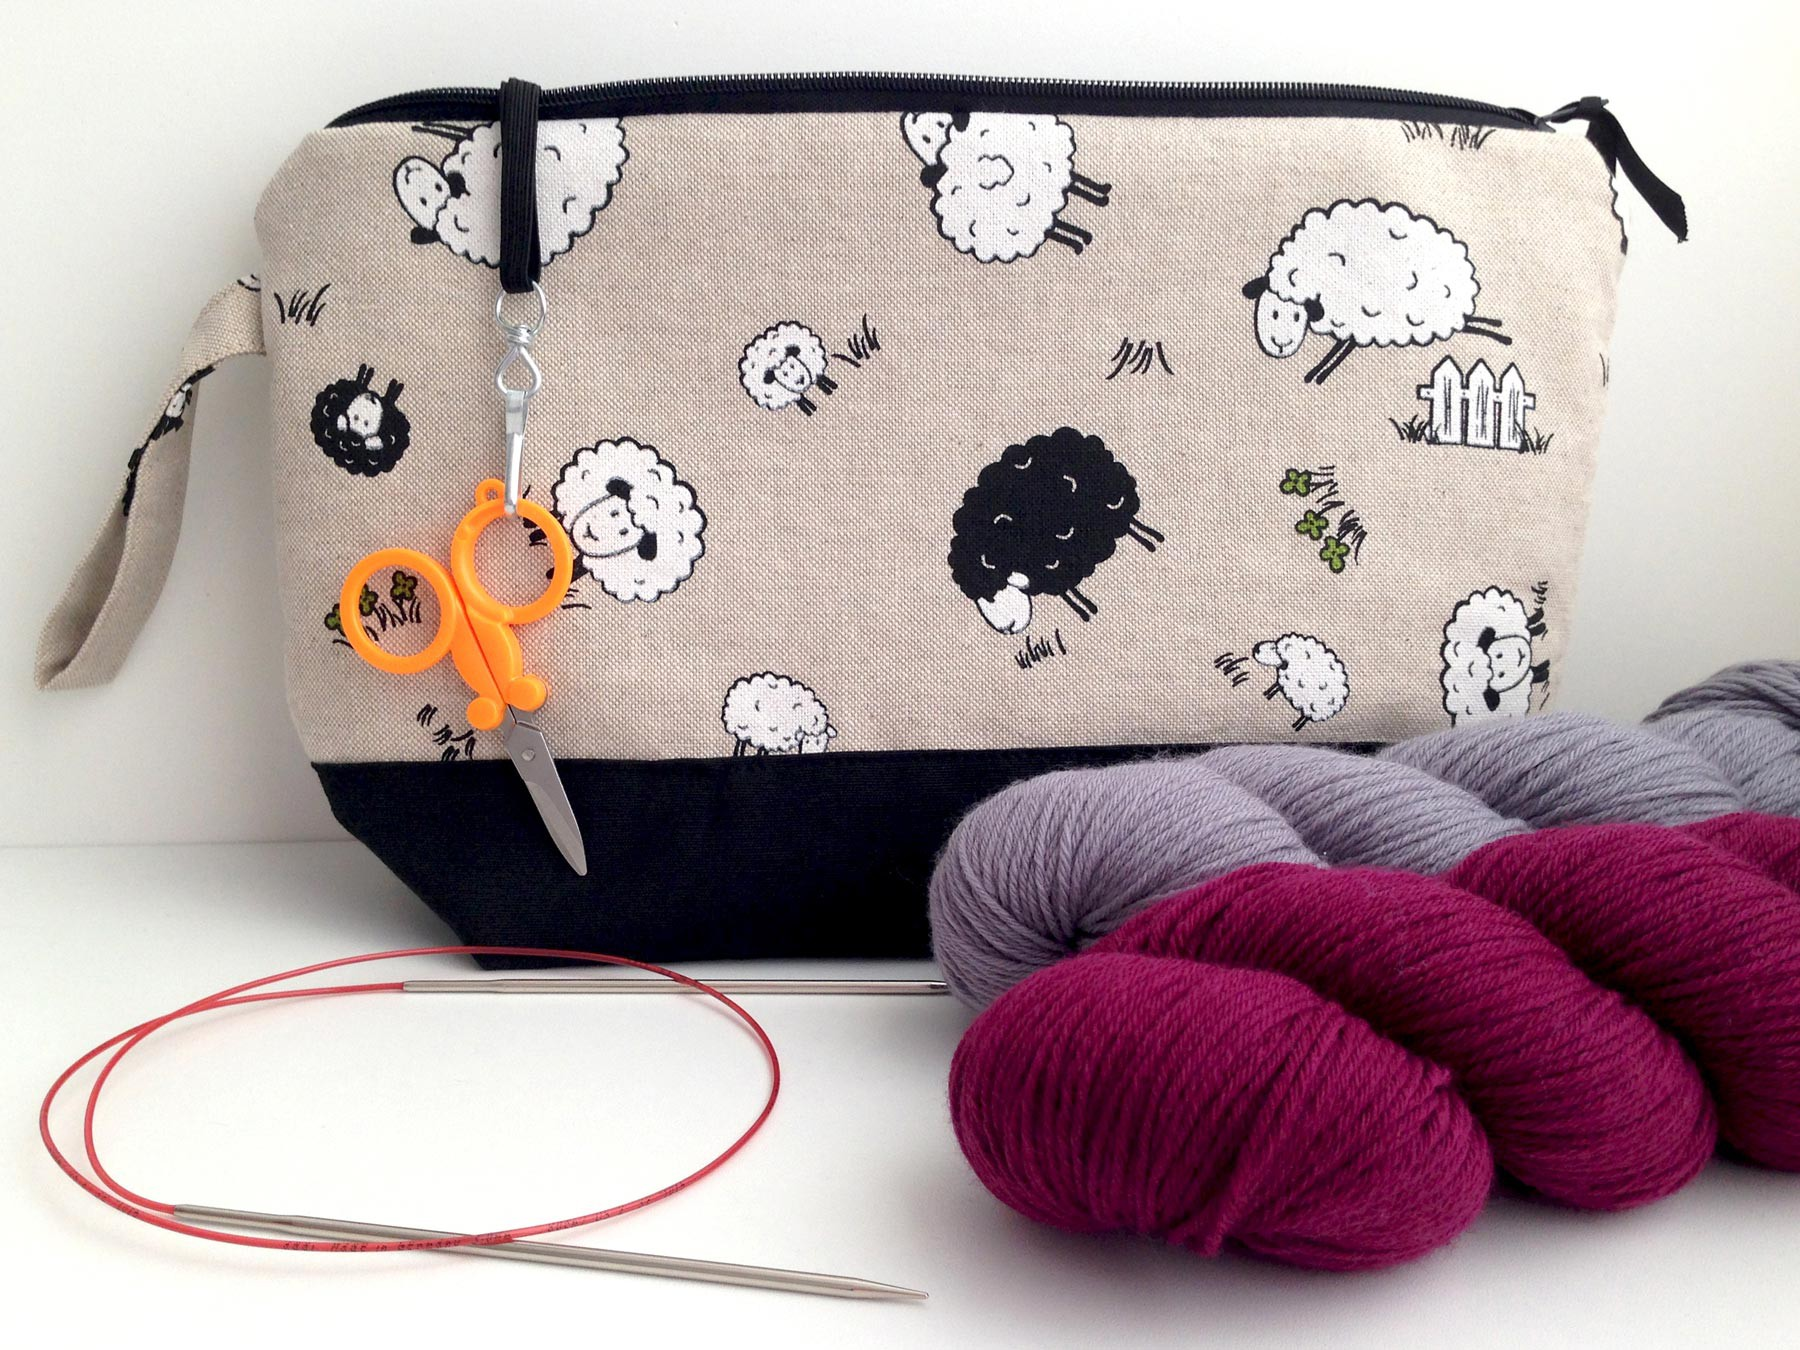 Handmade Horizontal Knitting Project Bag Sheep Black Canvas